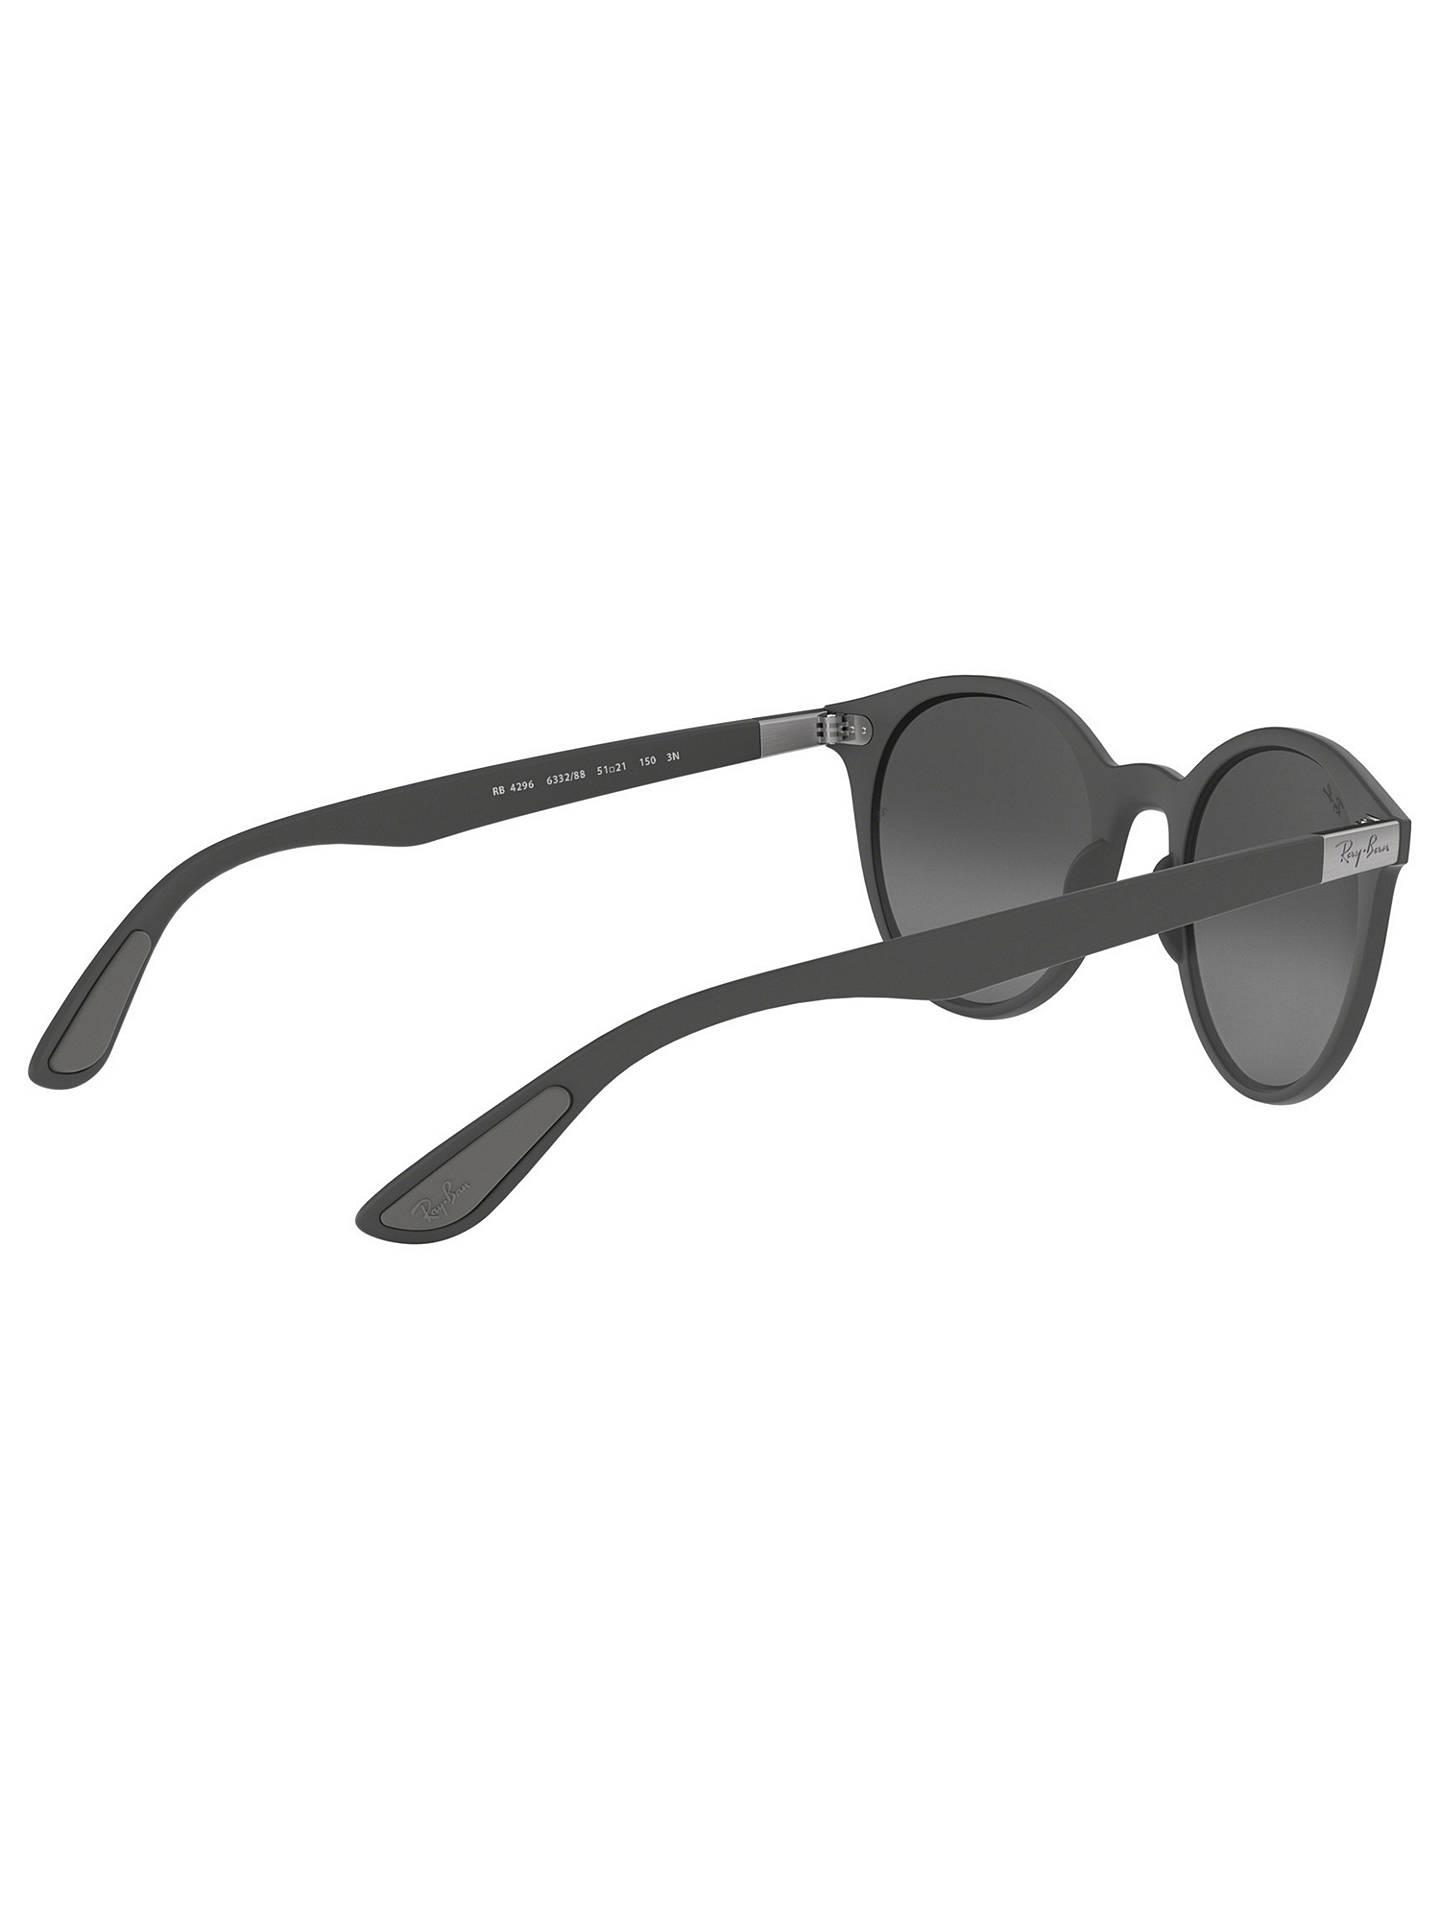 609b18d62b BuyRay-Ban RB4296 Unisex Oval Sunglasses